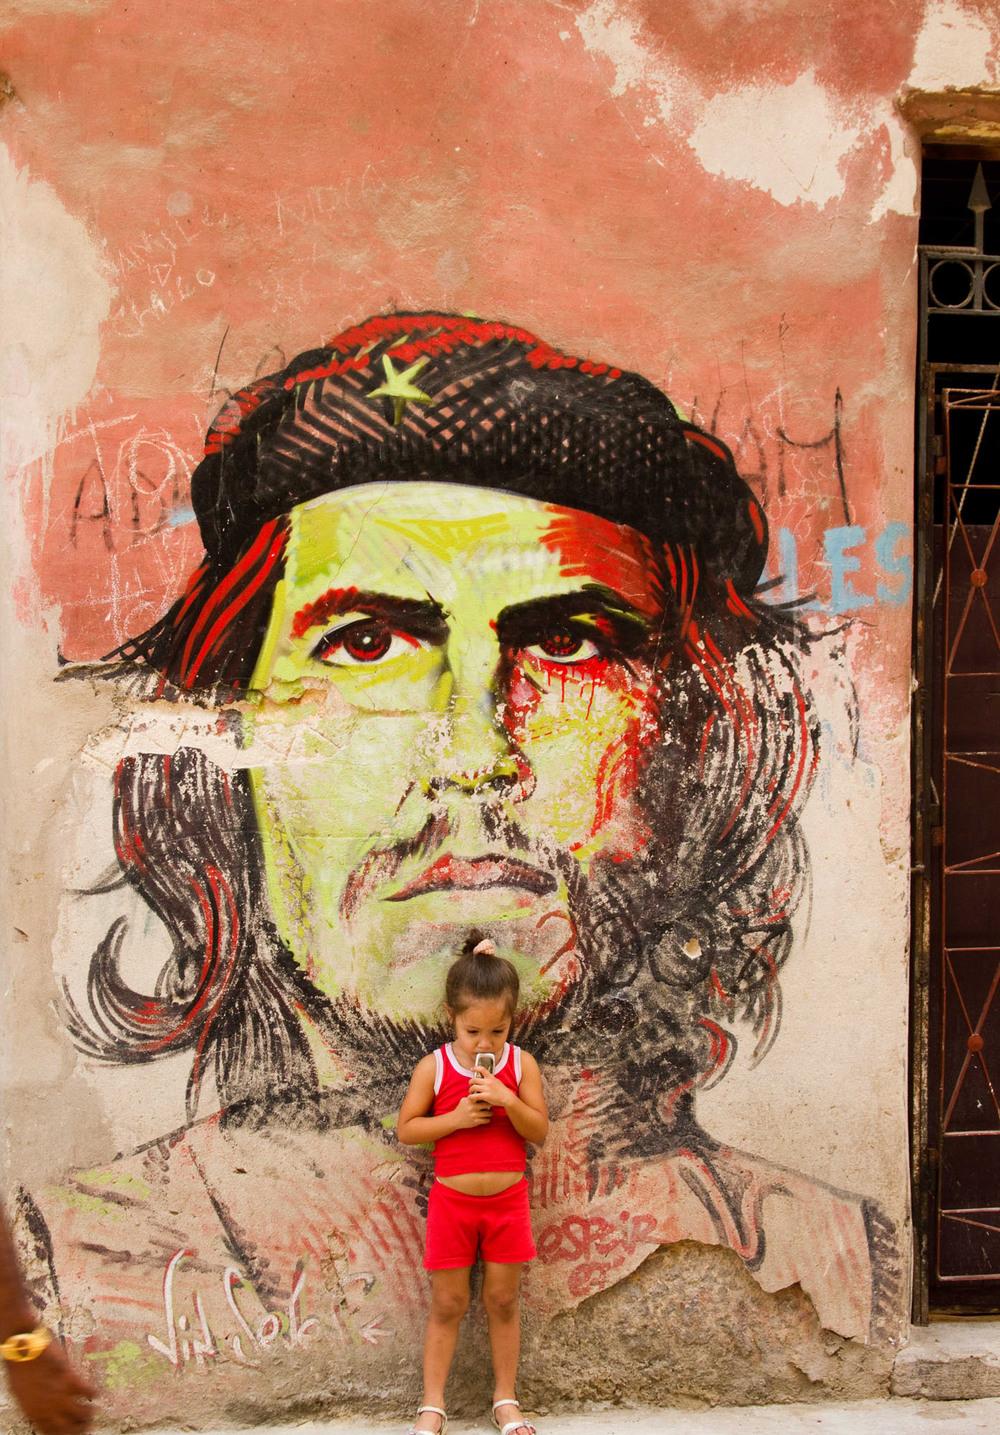 Gary_Cuba-46_GG.jpg